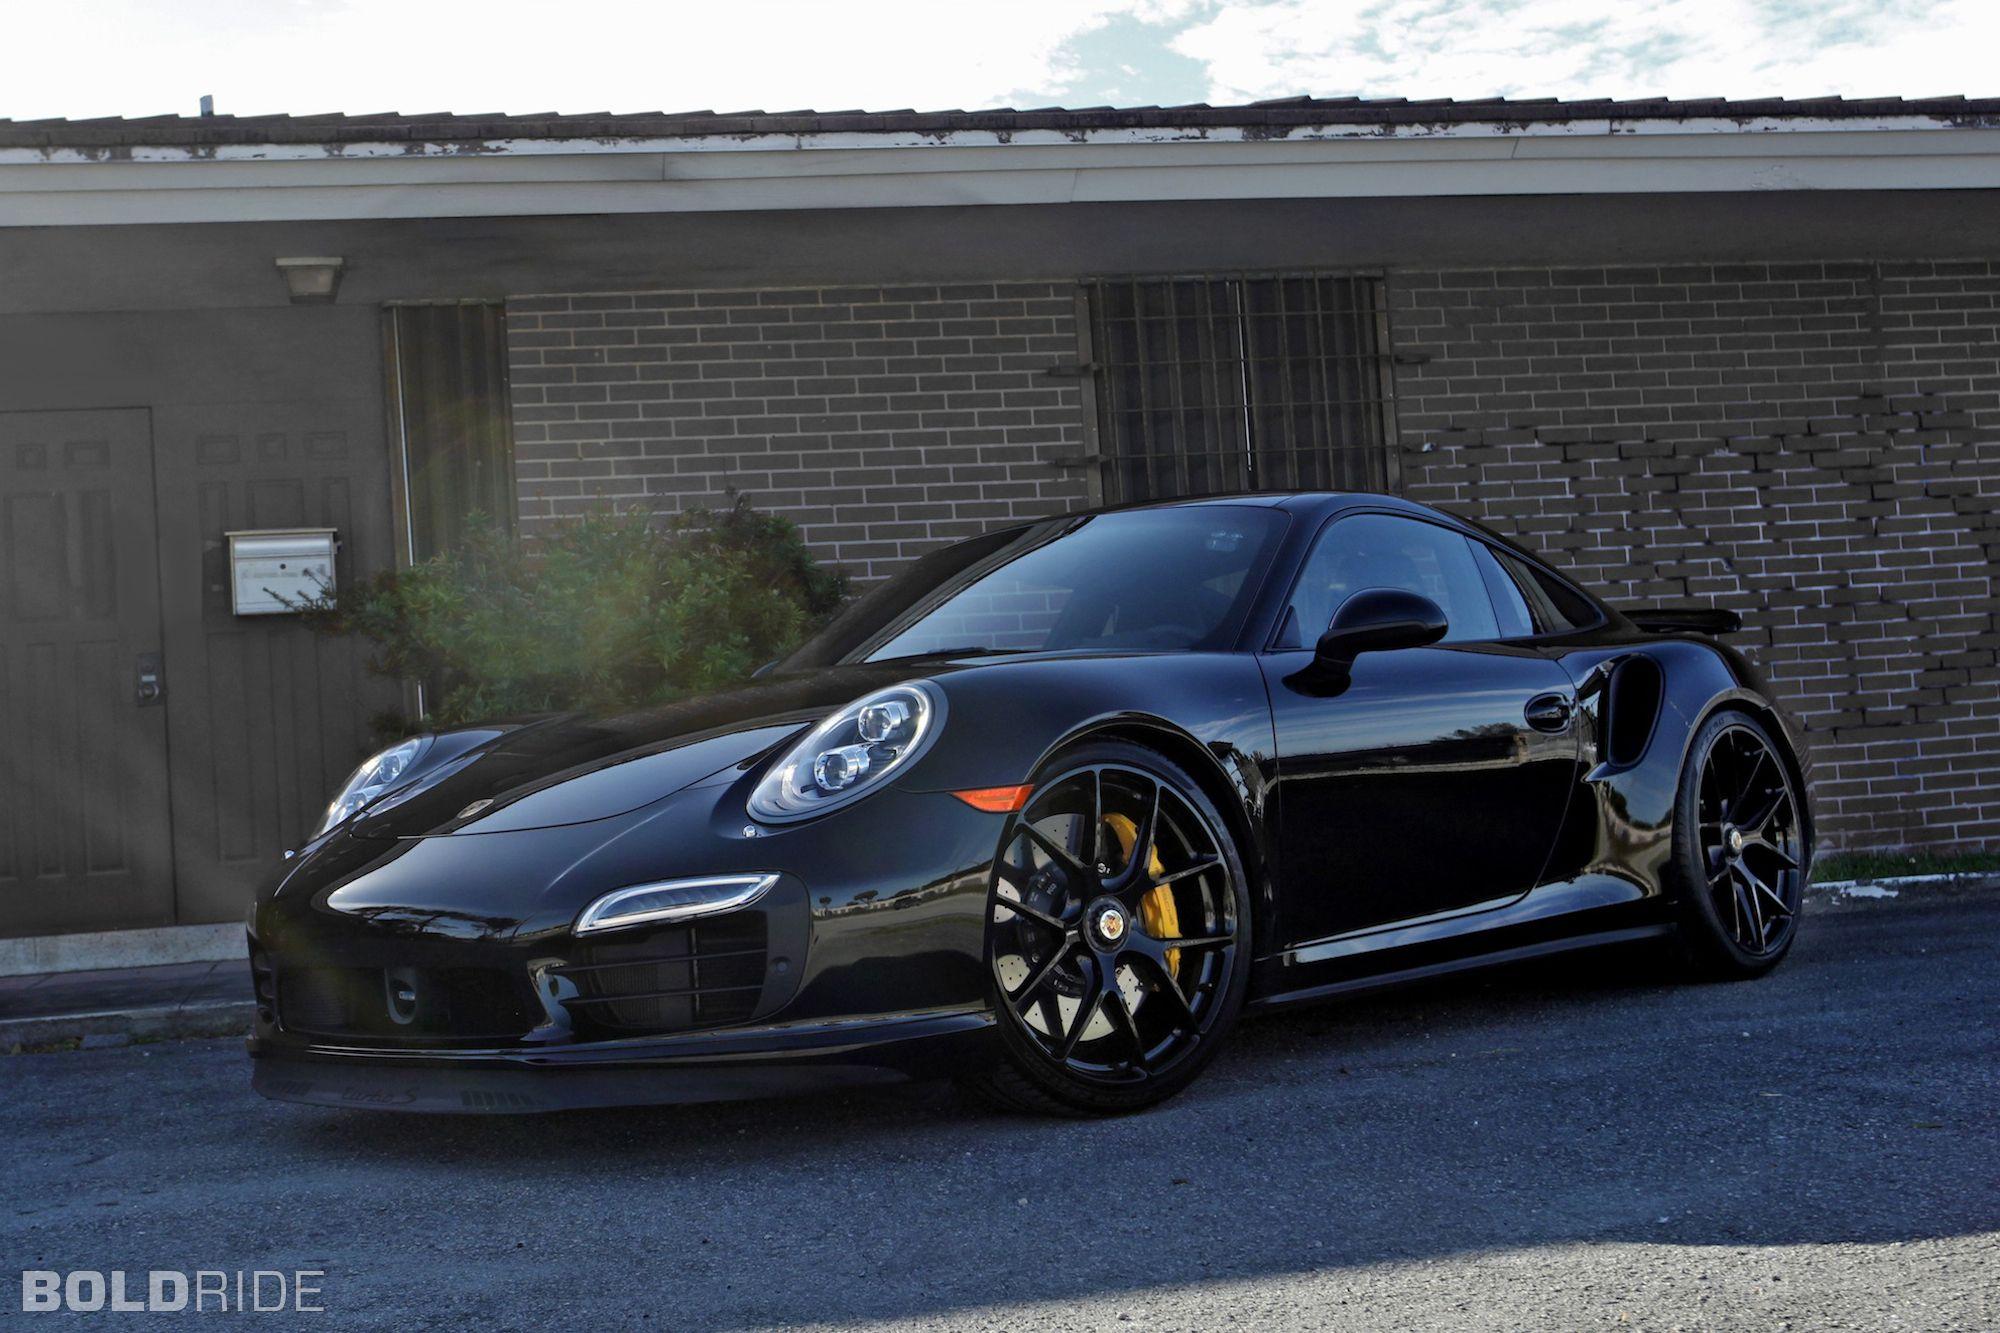 wheels-boutique-porsche-911-turbo-s.2000x1333.Feb-14-2014_09.18.43